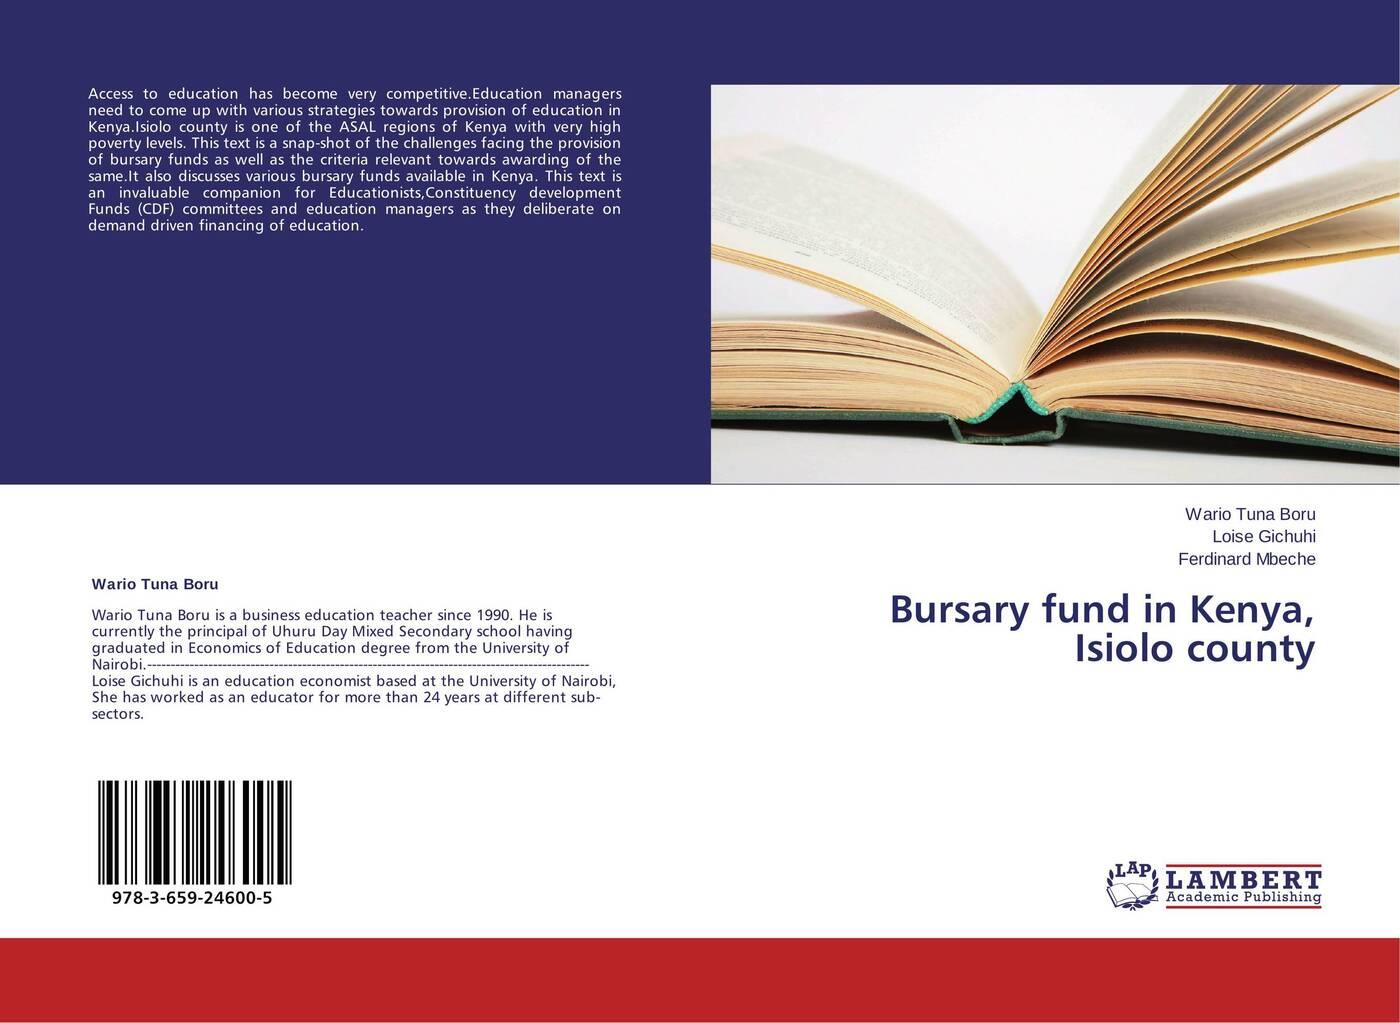 Wario Tuna Boru,Loise Gichuhi and Ferdinard Mbeche Bursary fund in Kenya, Isiolo county joseph lelan inclusive education in kenya